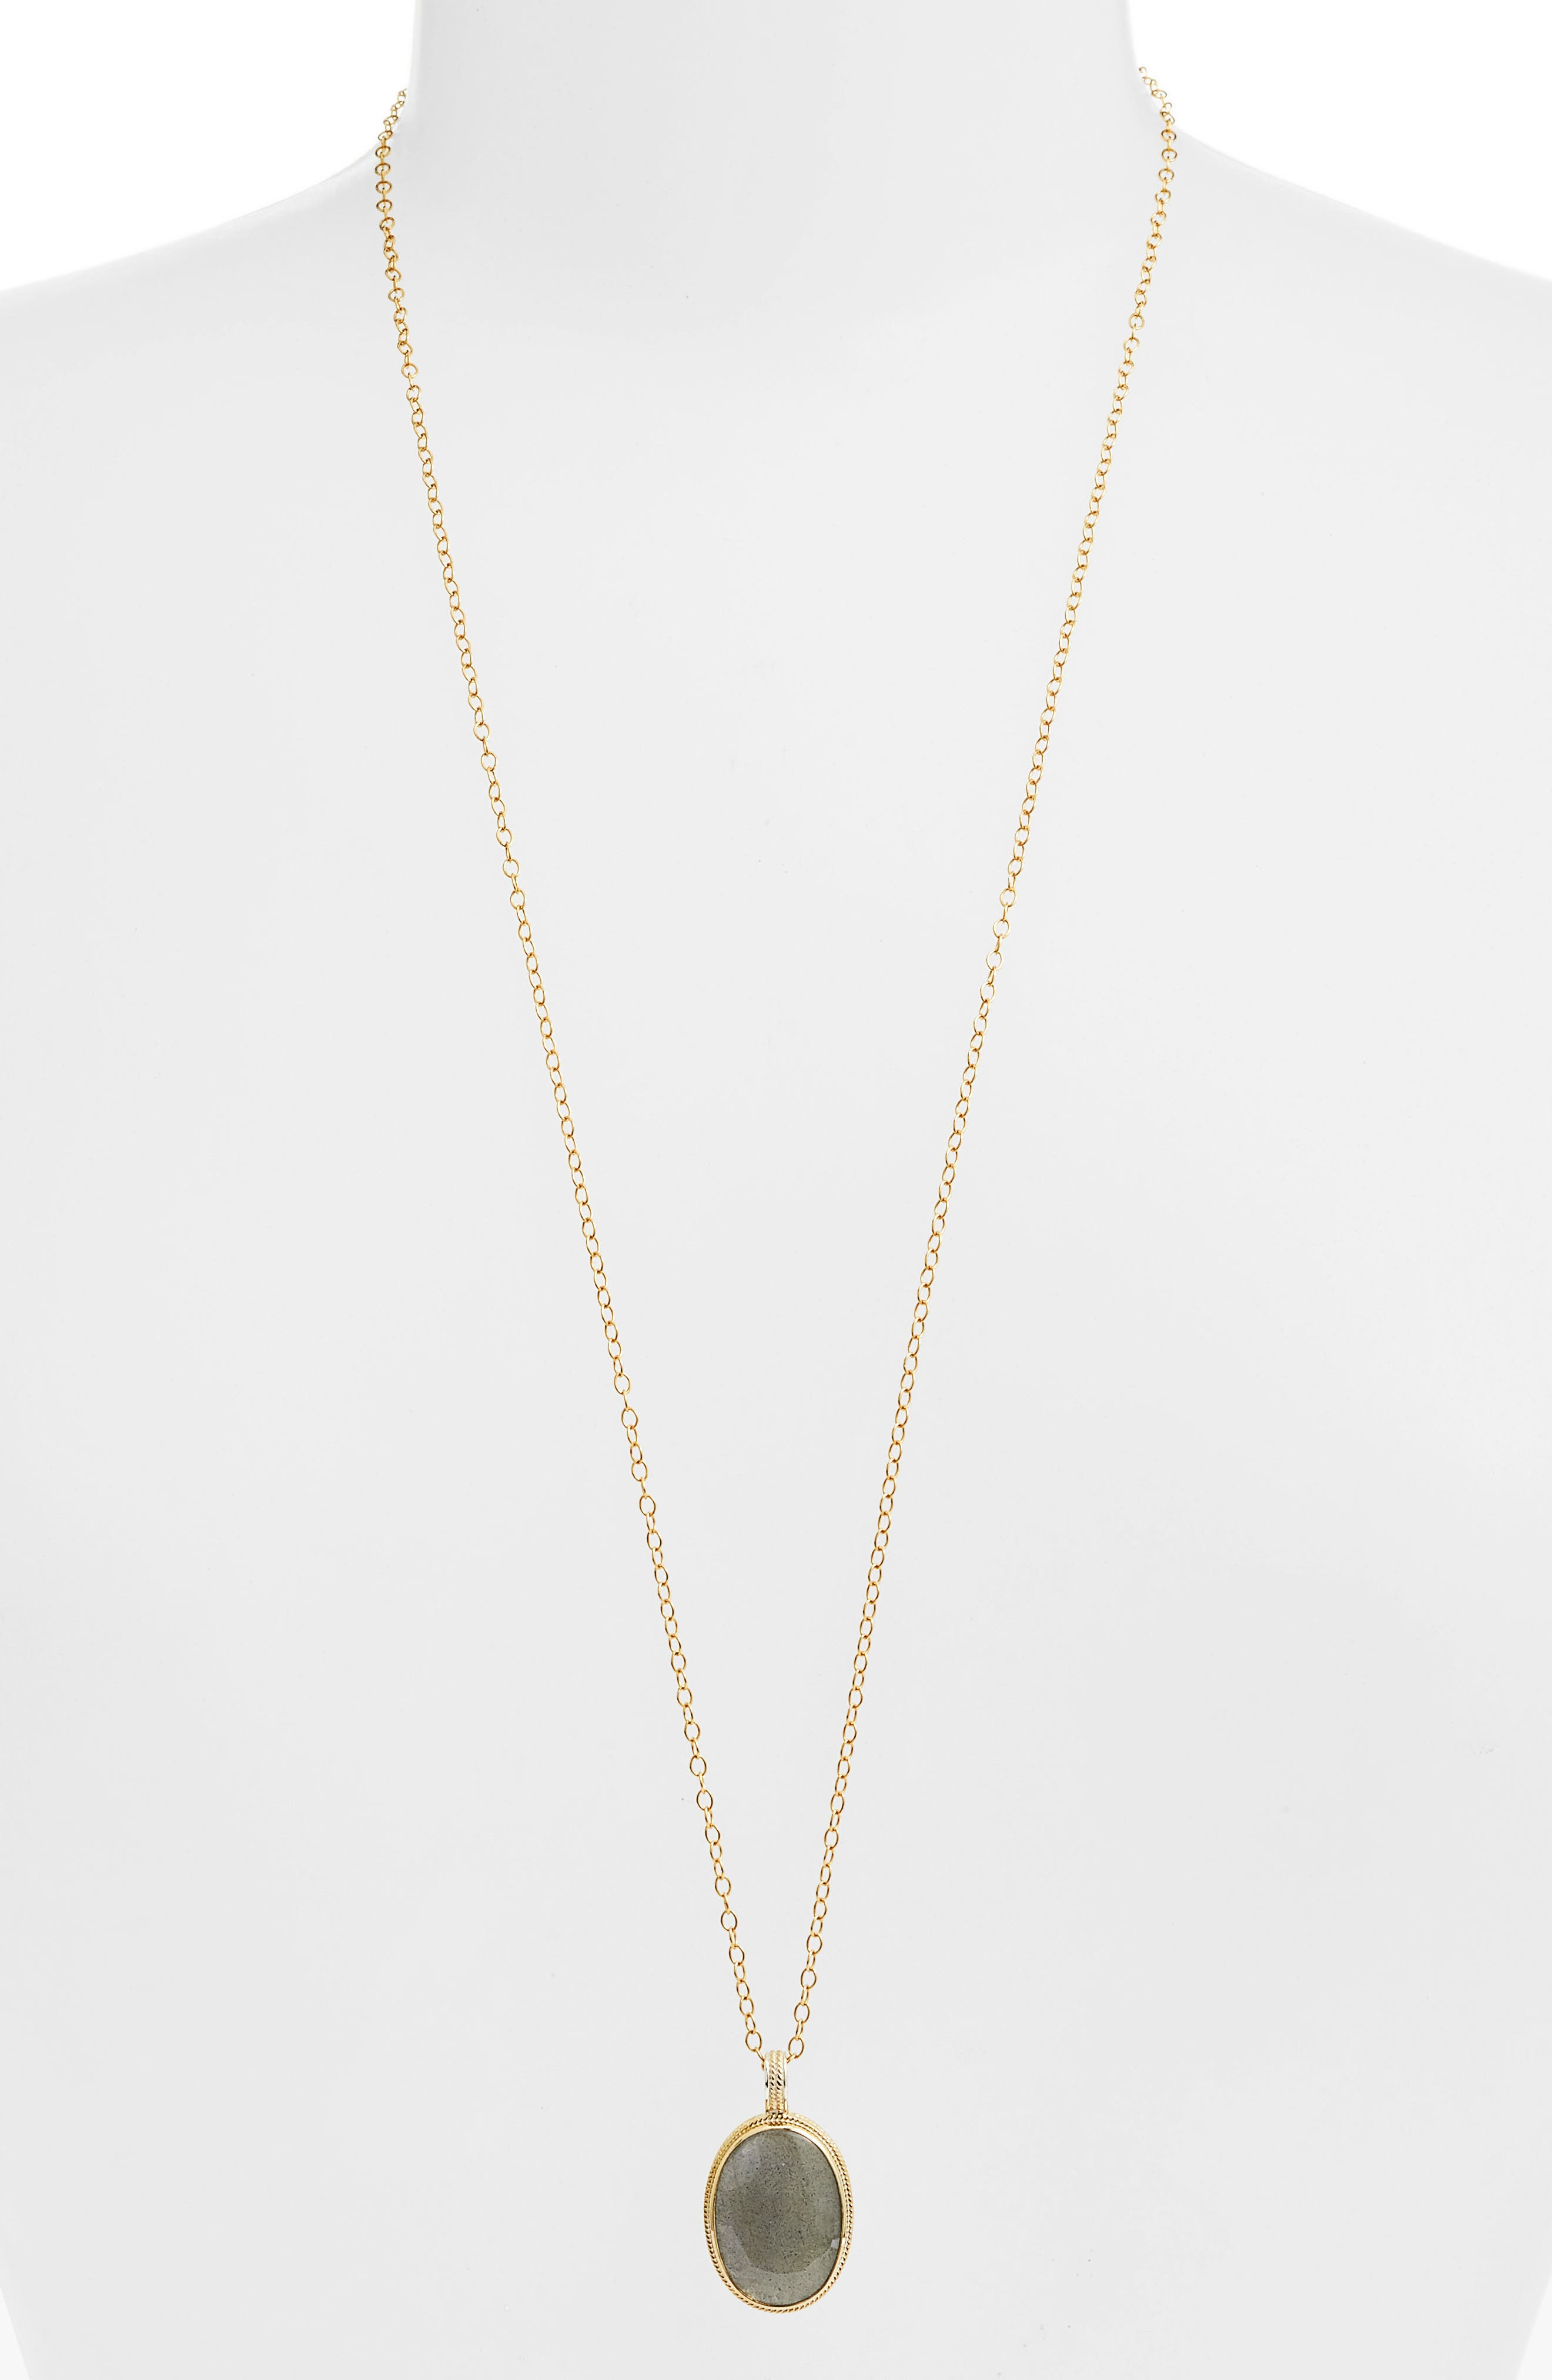 Semiprecious Stone Pendant Necklace,                         Main,                         color, GOLD/ LABRADORITE